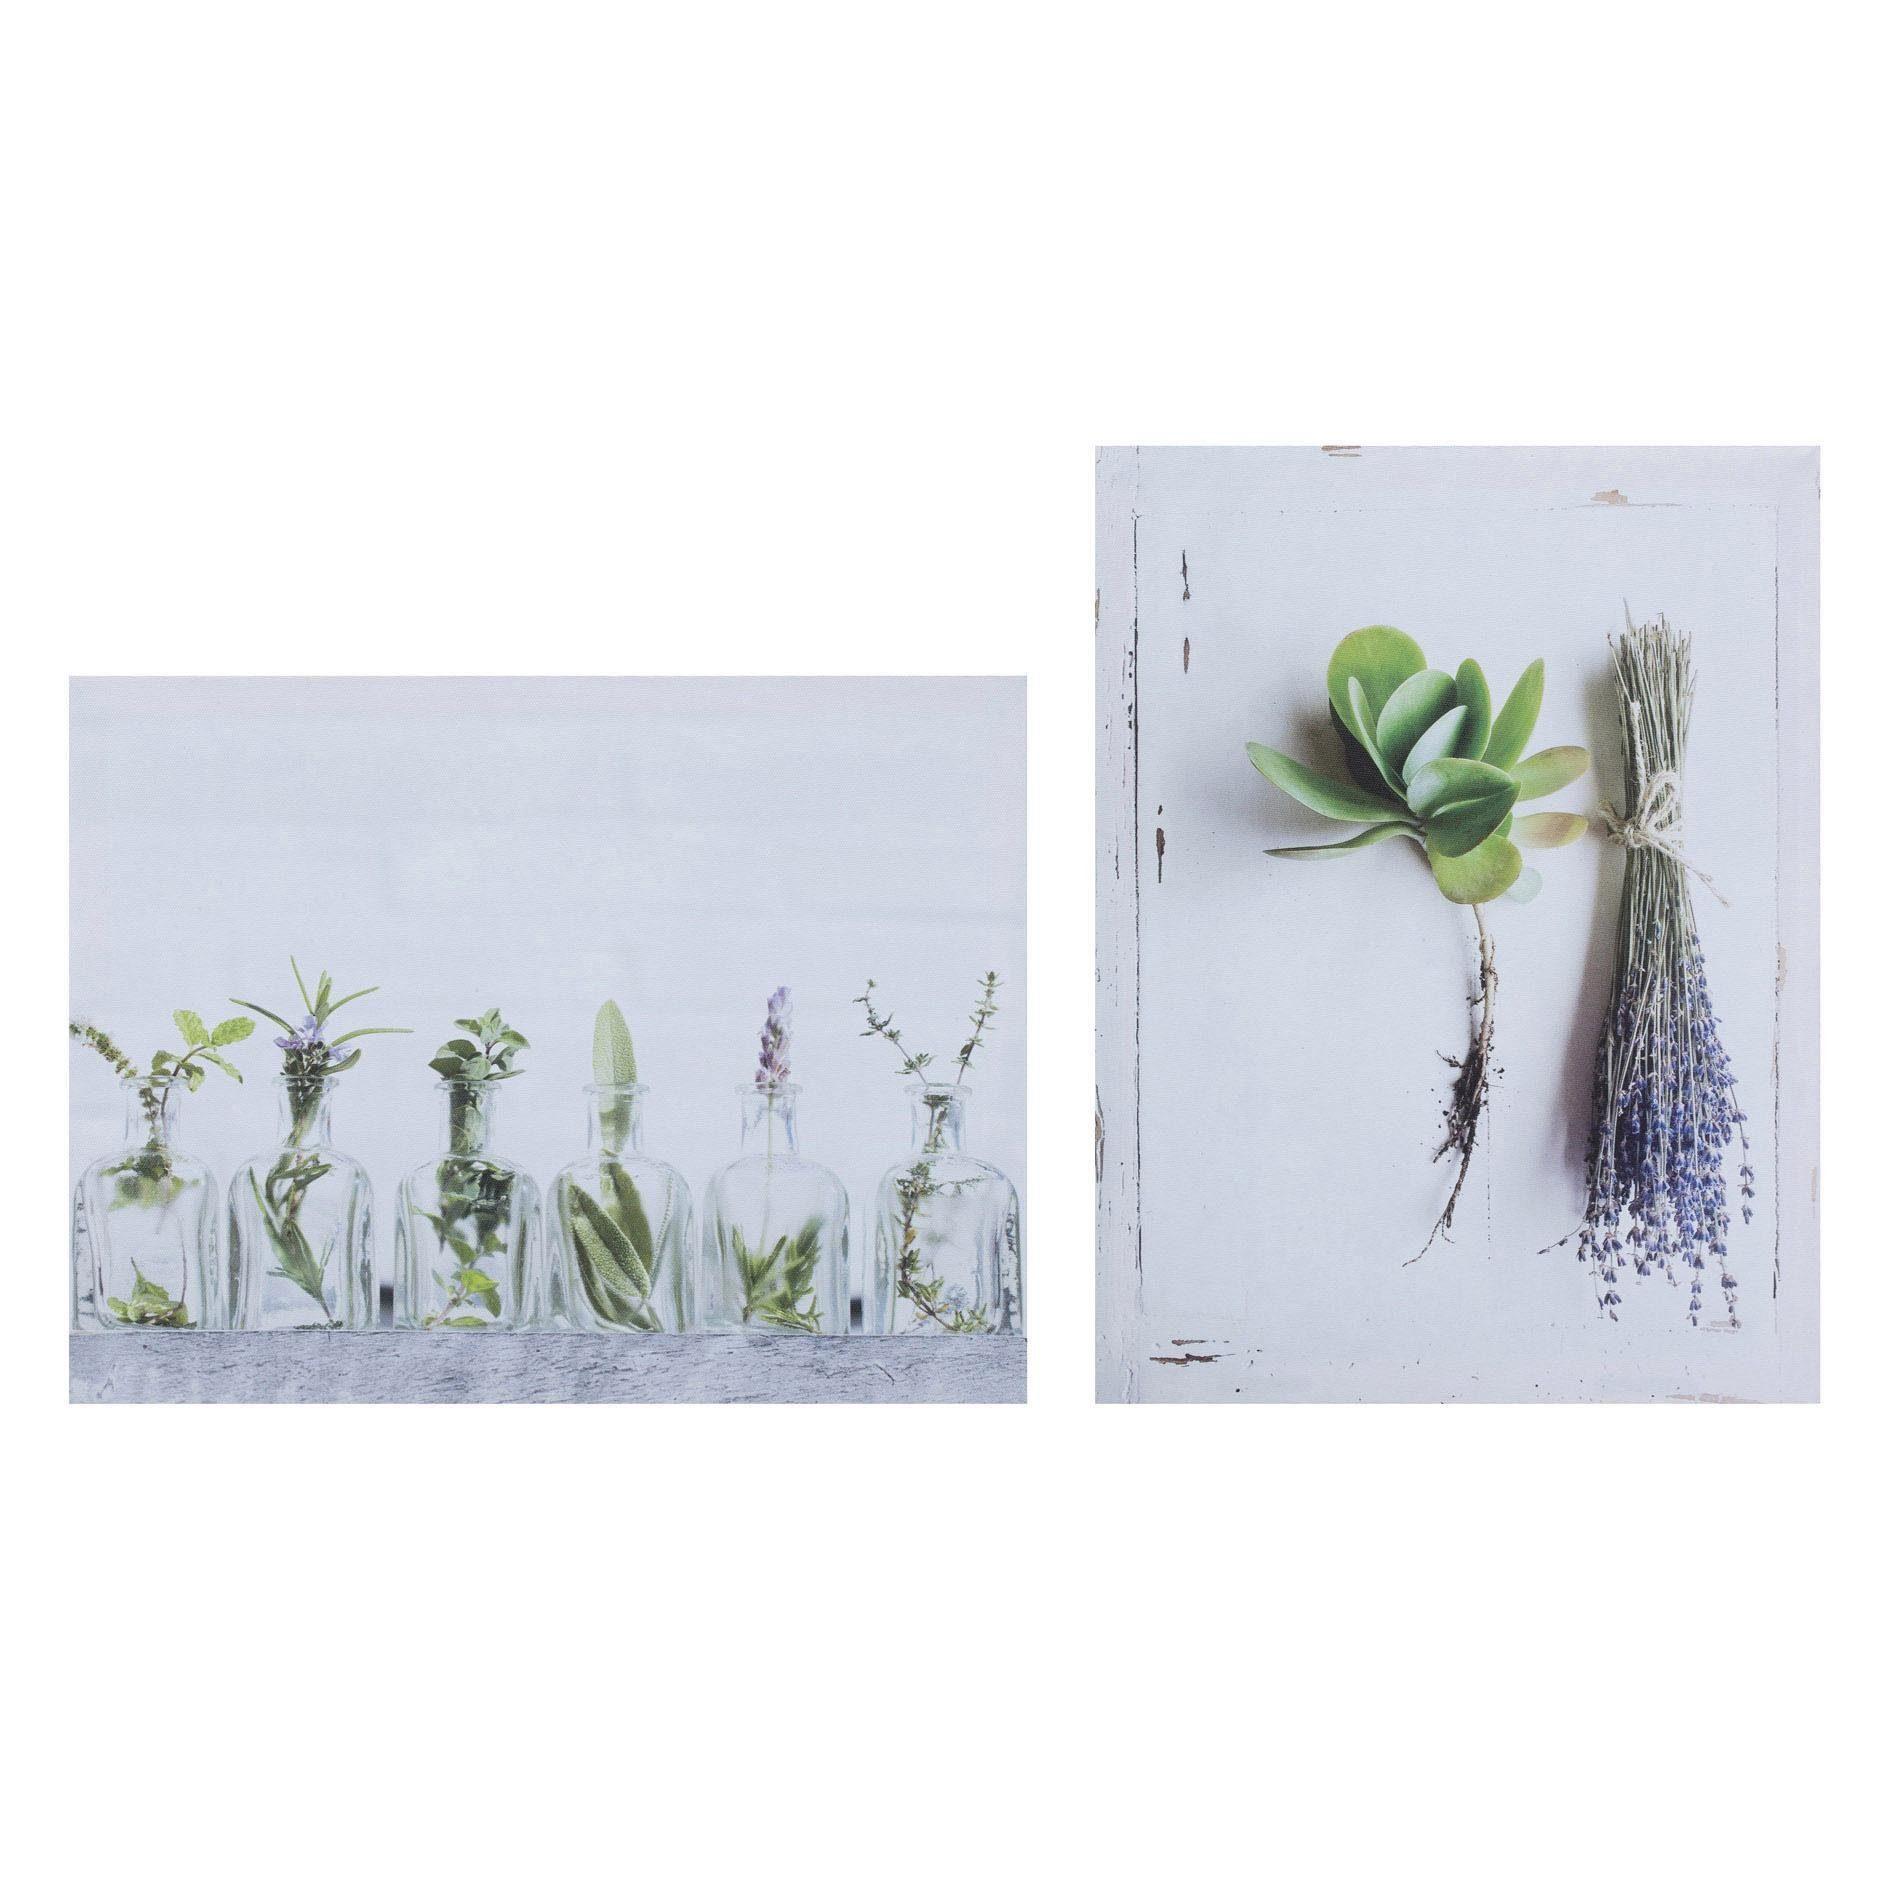 Leinwandbild »HERBS«, Blume (Set), 2er Set